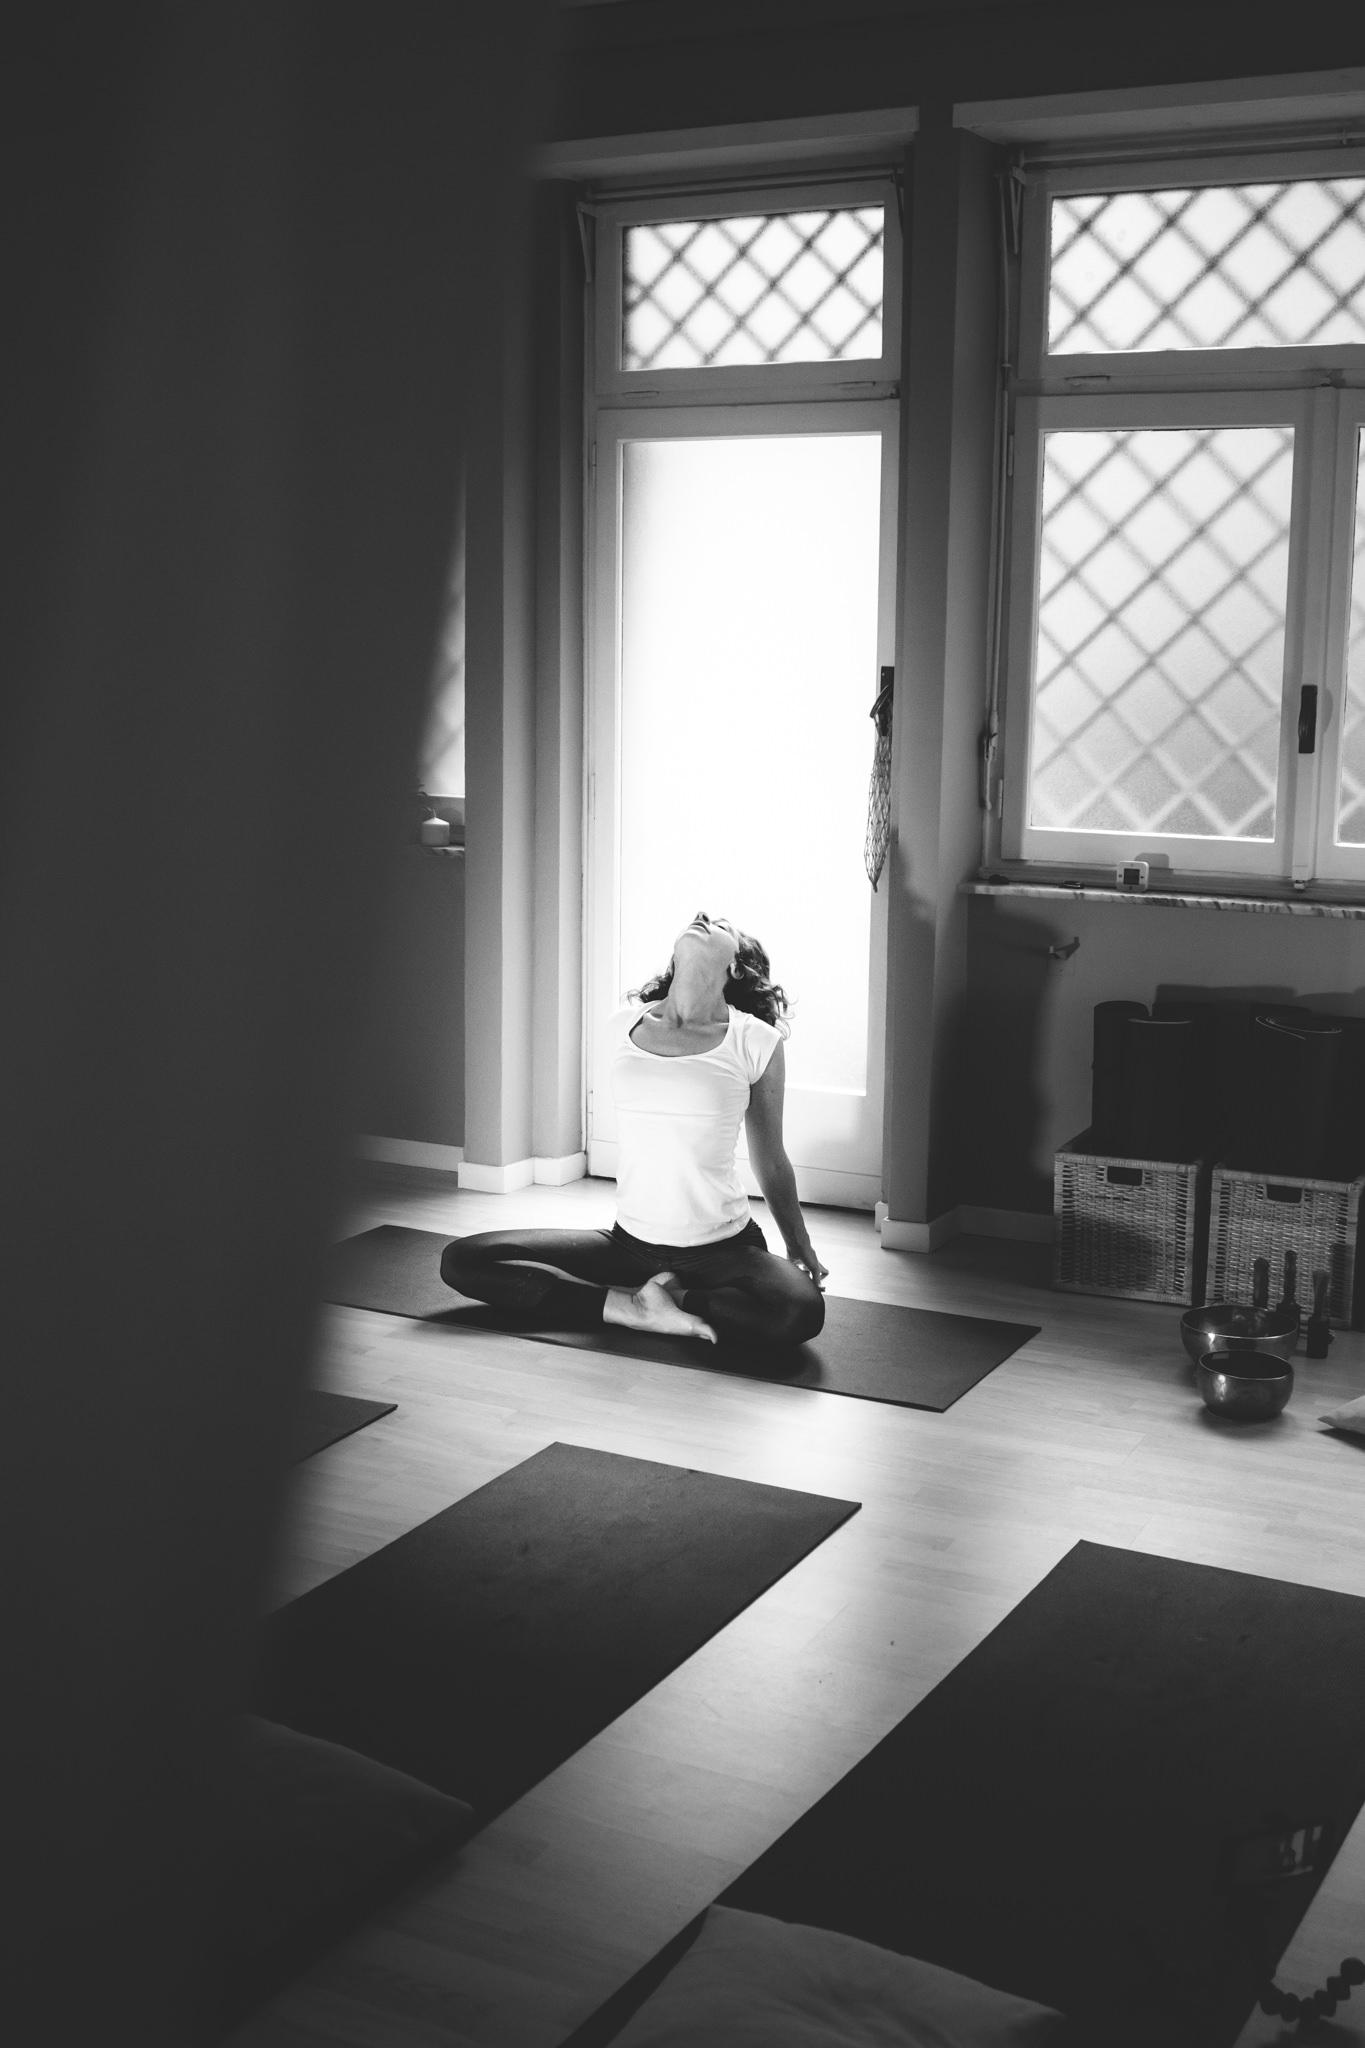 luna_hatha_yoga_inglese_english_torino-4.jpg